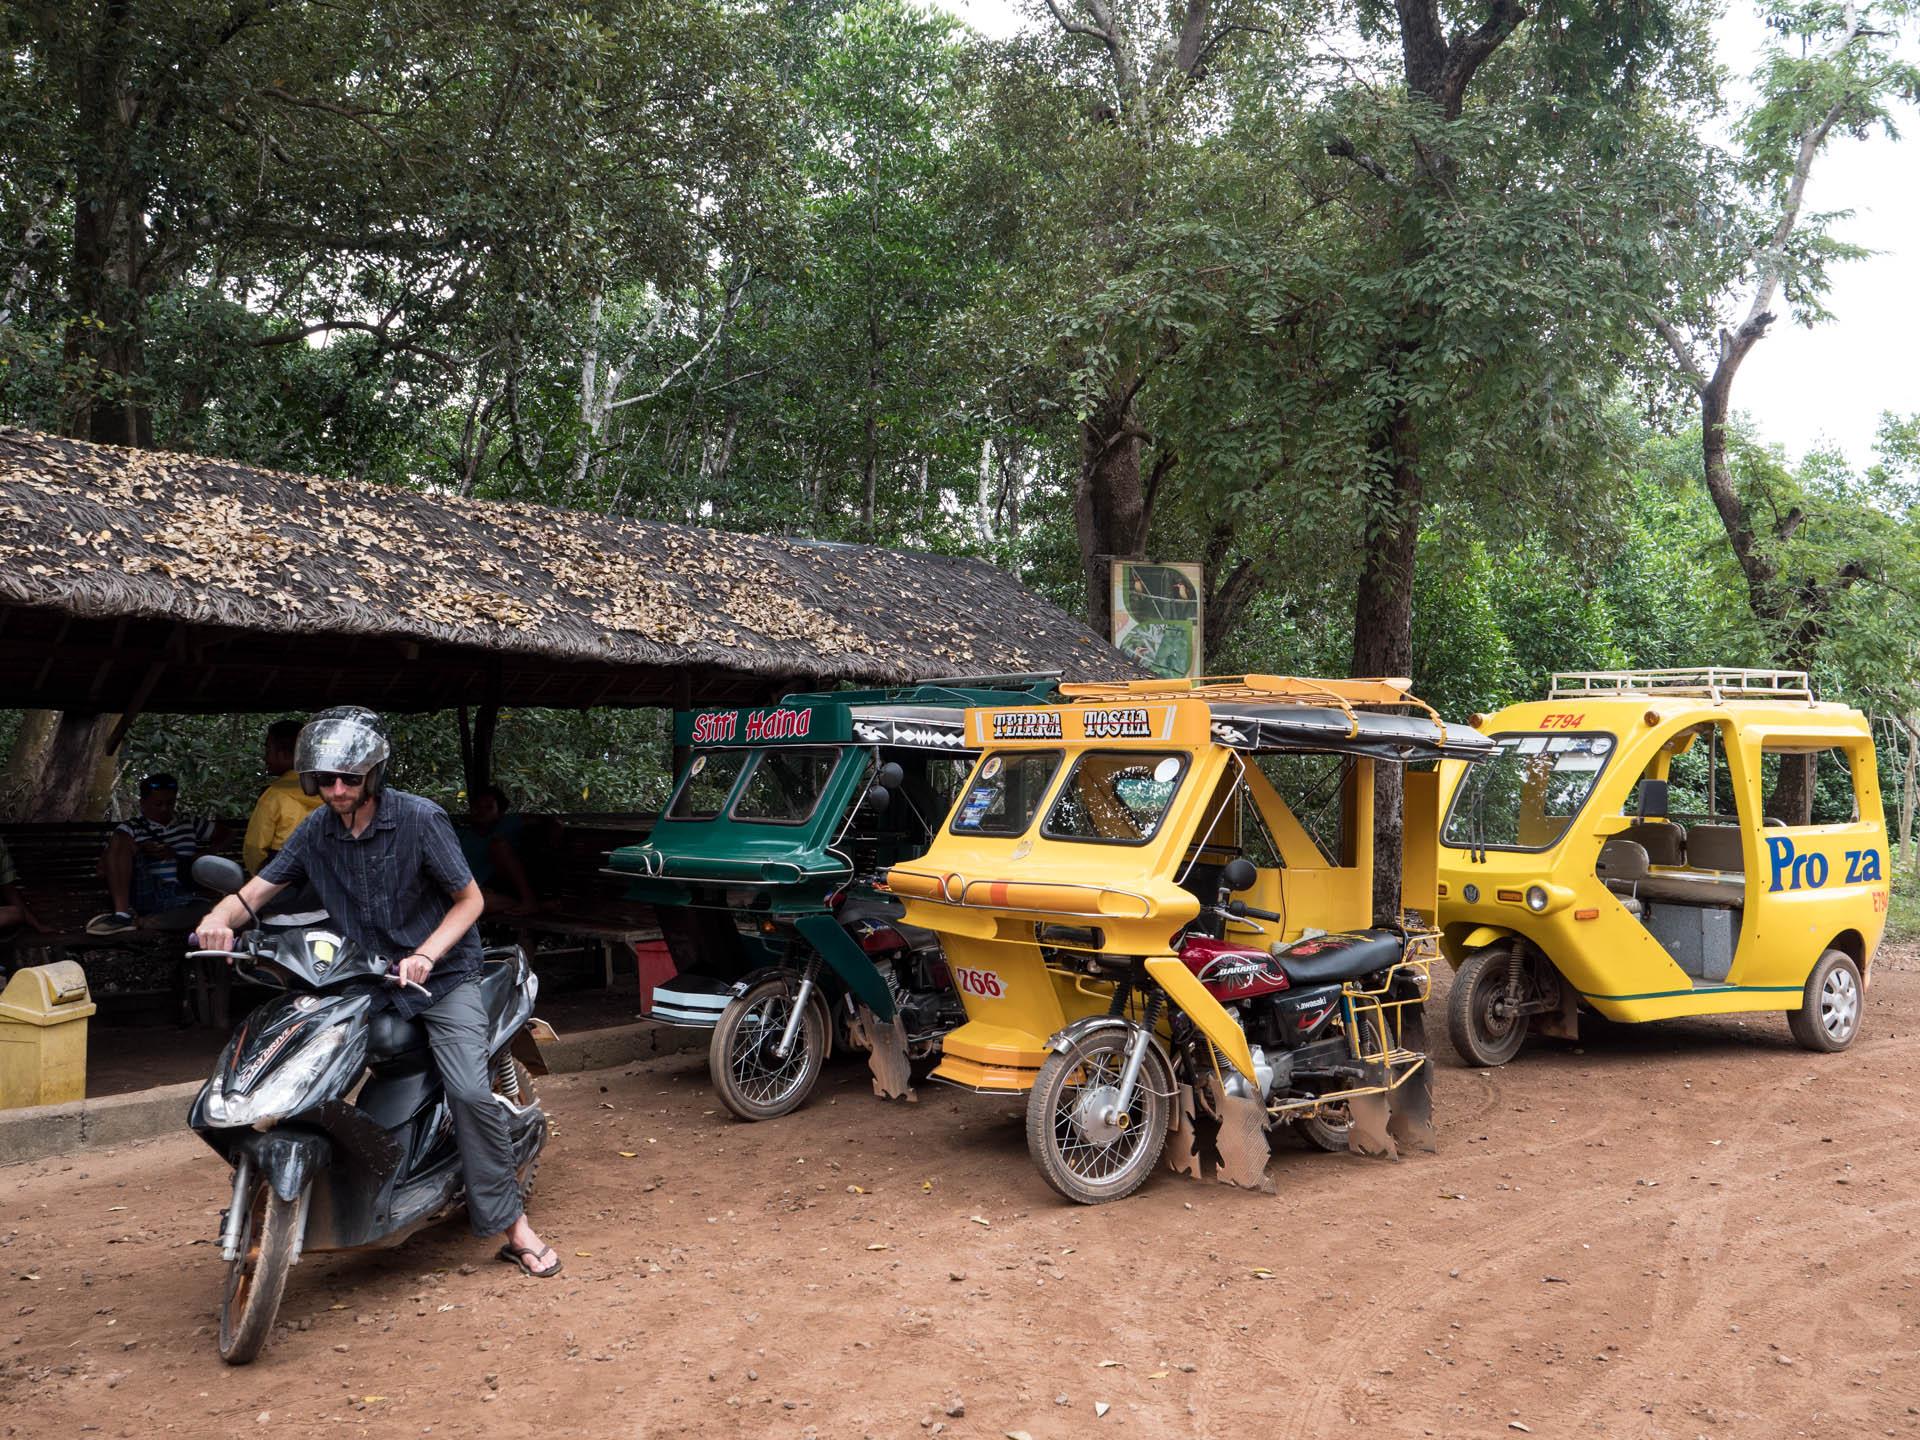 Coron scooter - Les globe blogueurs - blog voyage nature